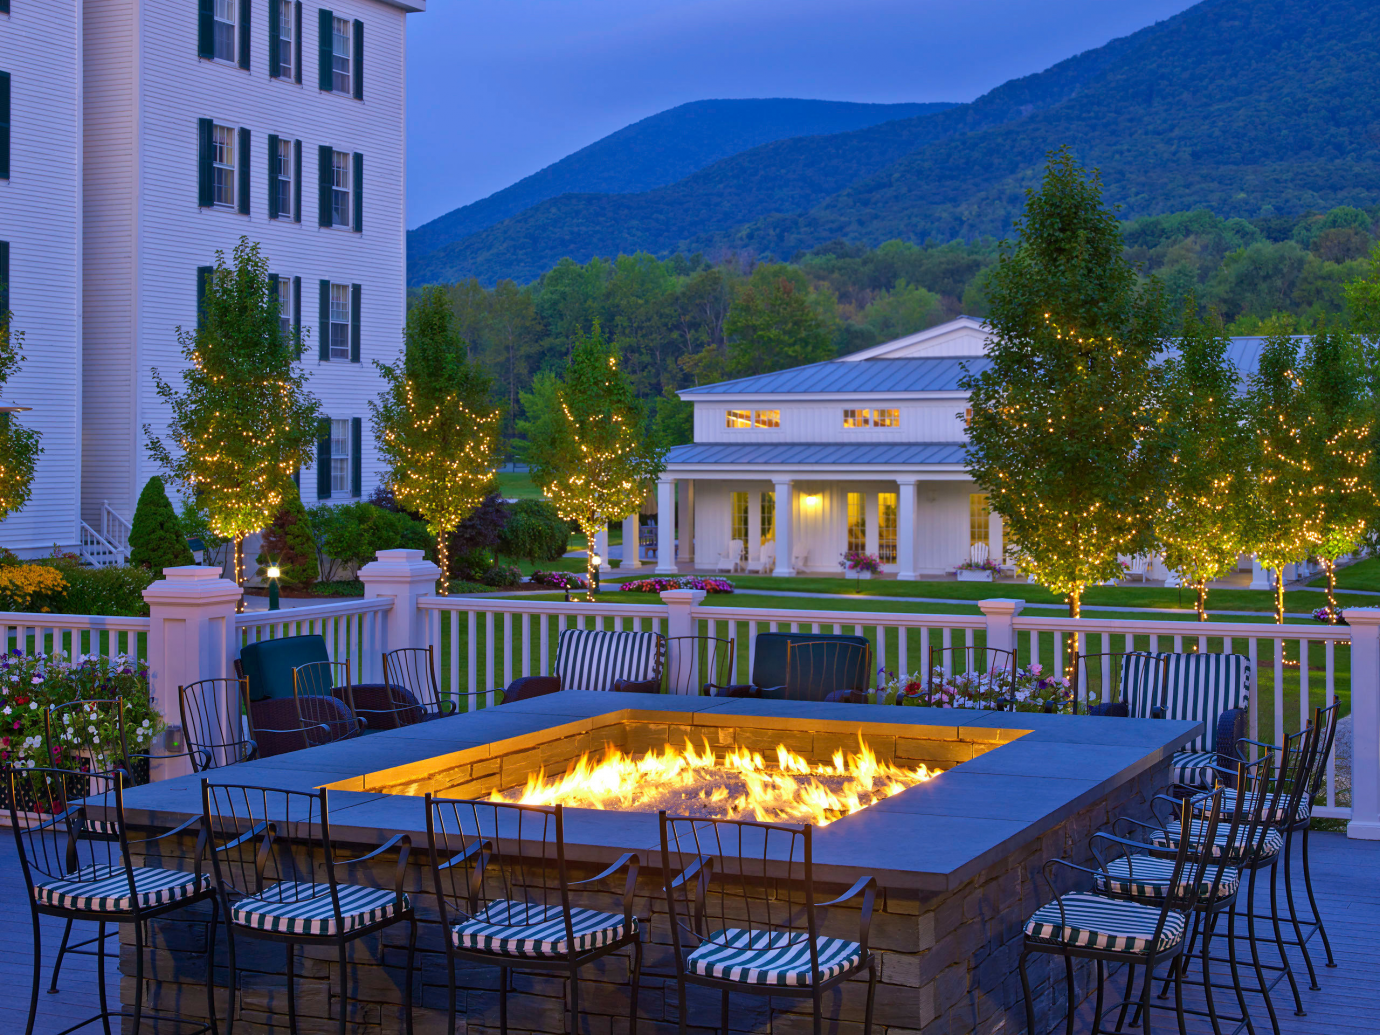 Outdoor fire pit at dusk at Equinox Golf Resort & Spa